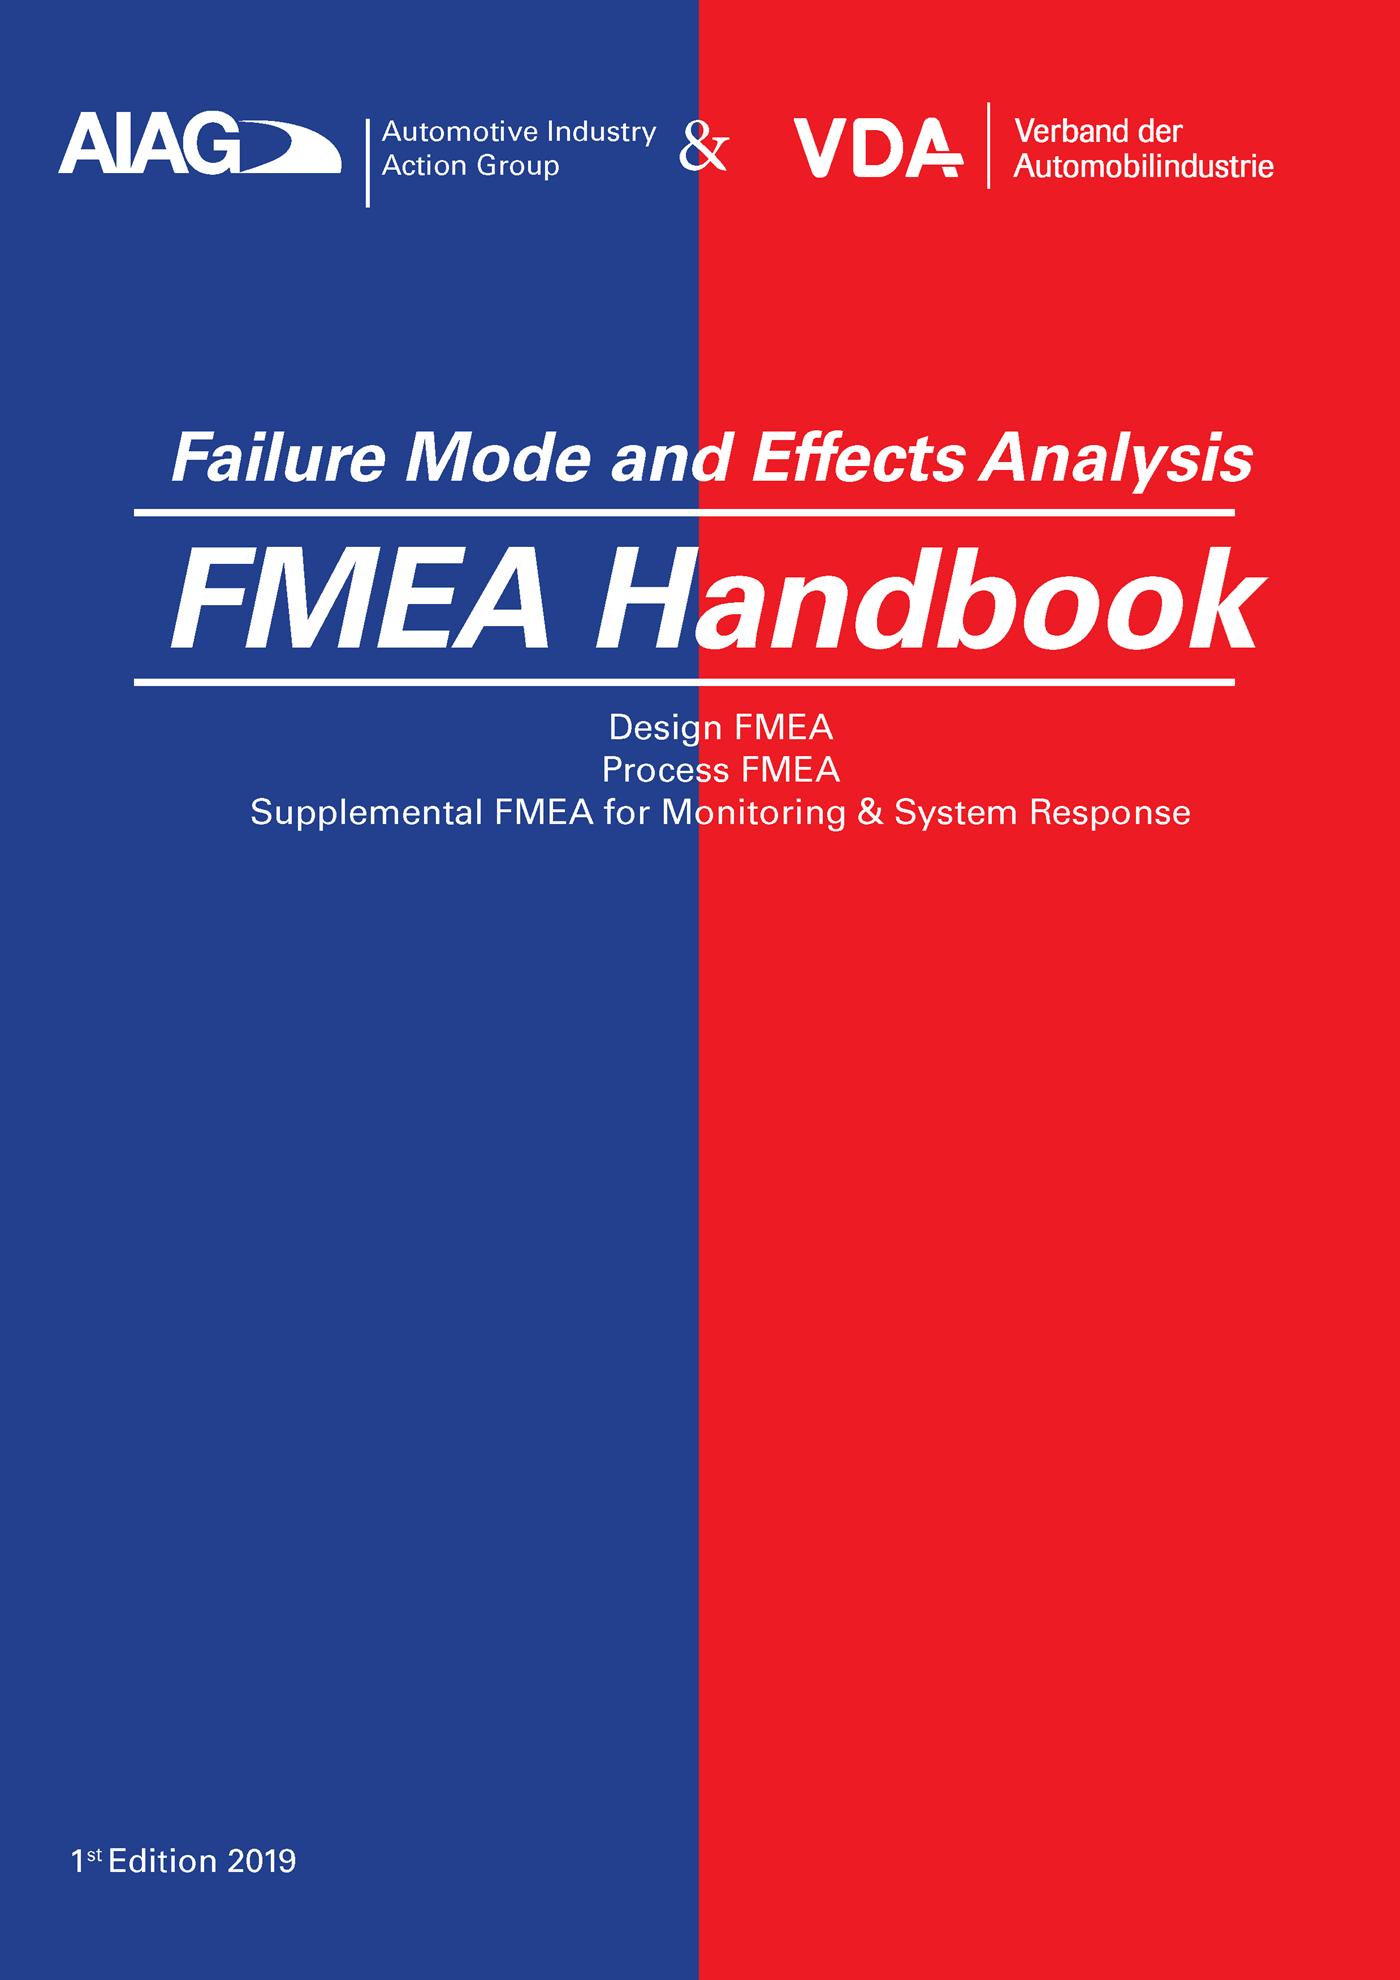 Bild von AIAG & VDA FMEA-Handbook_ENGLISH